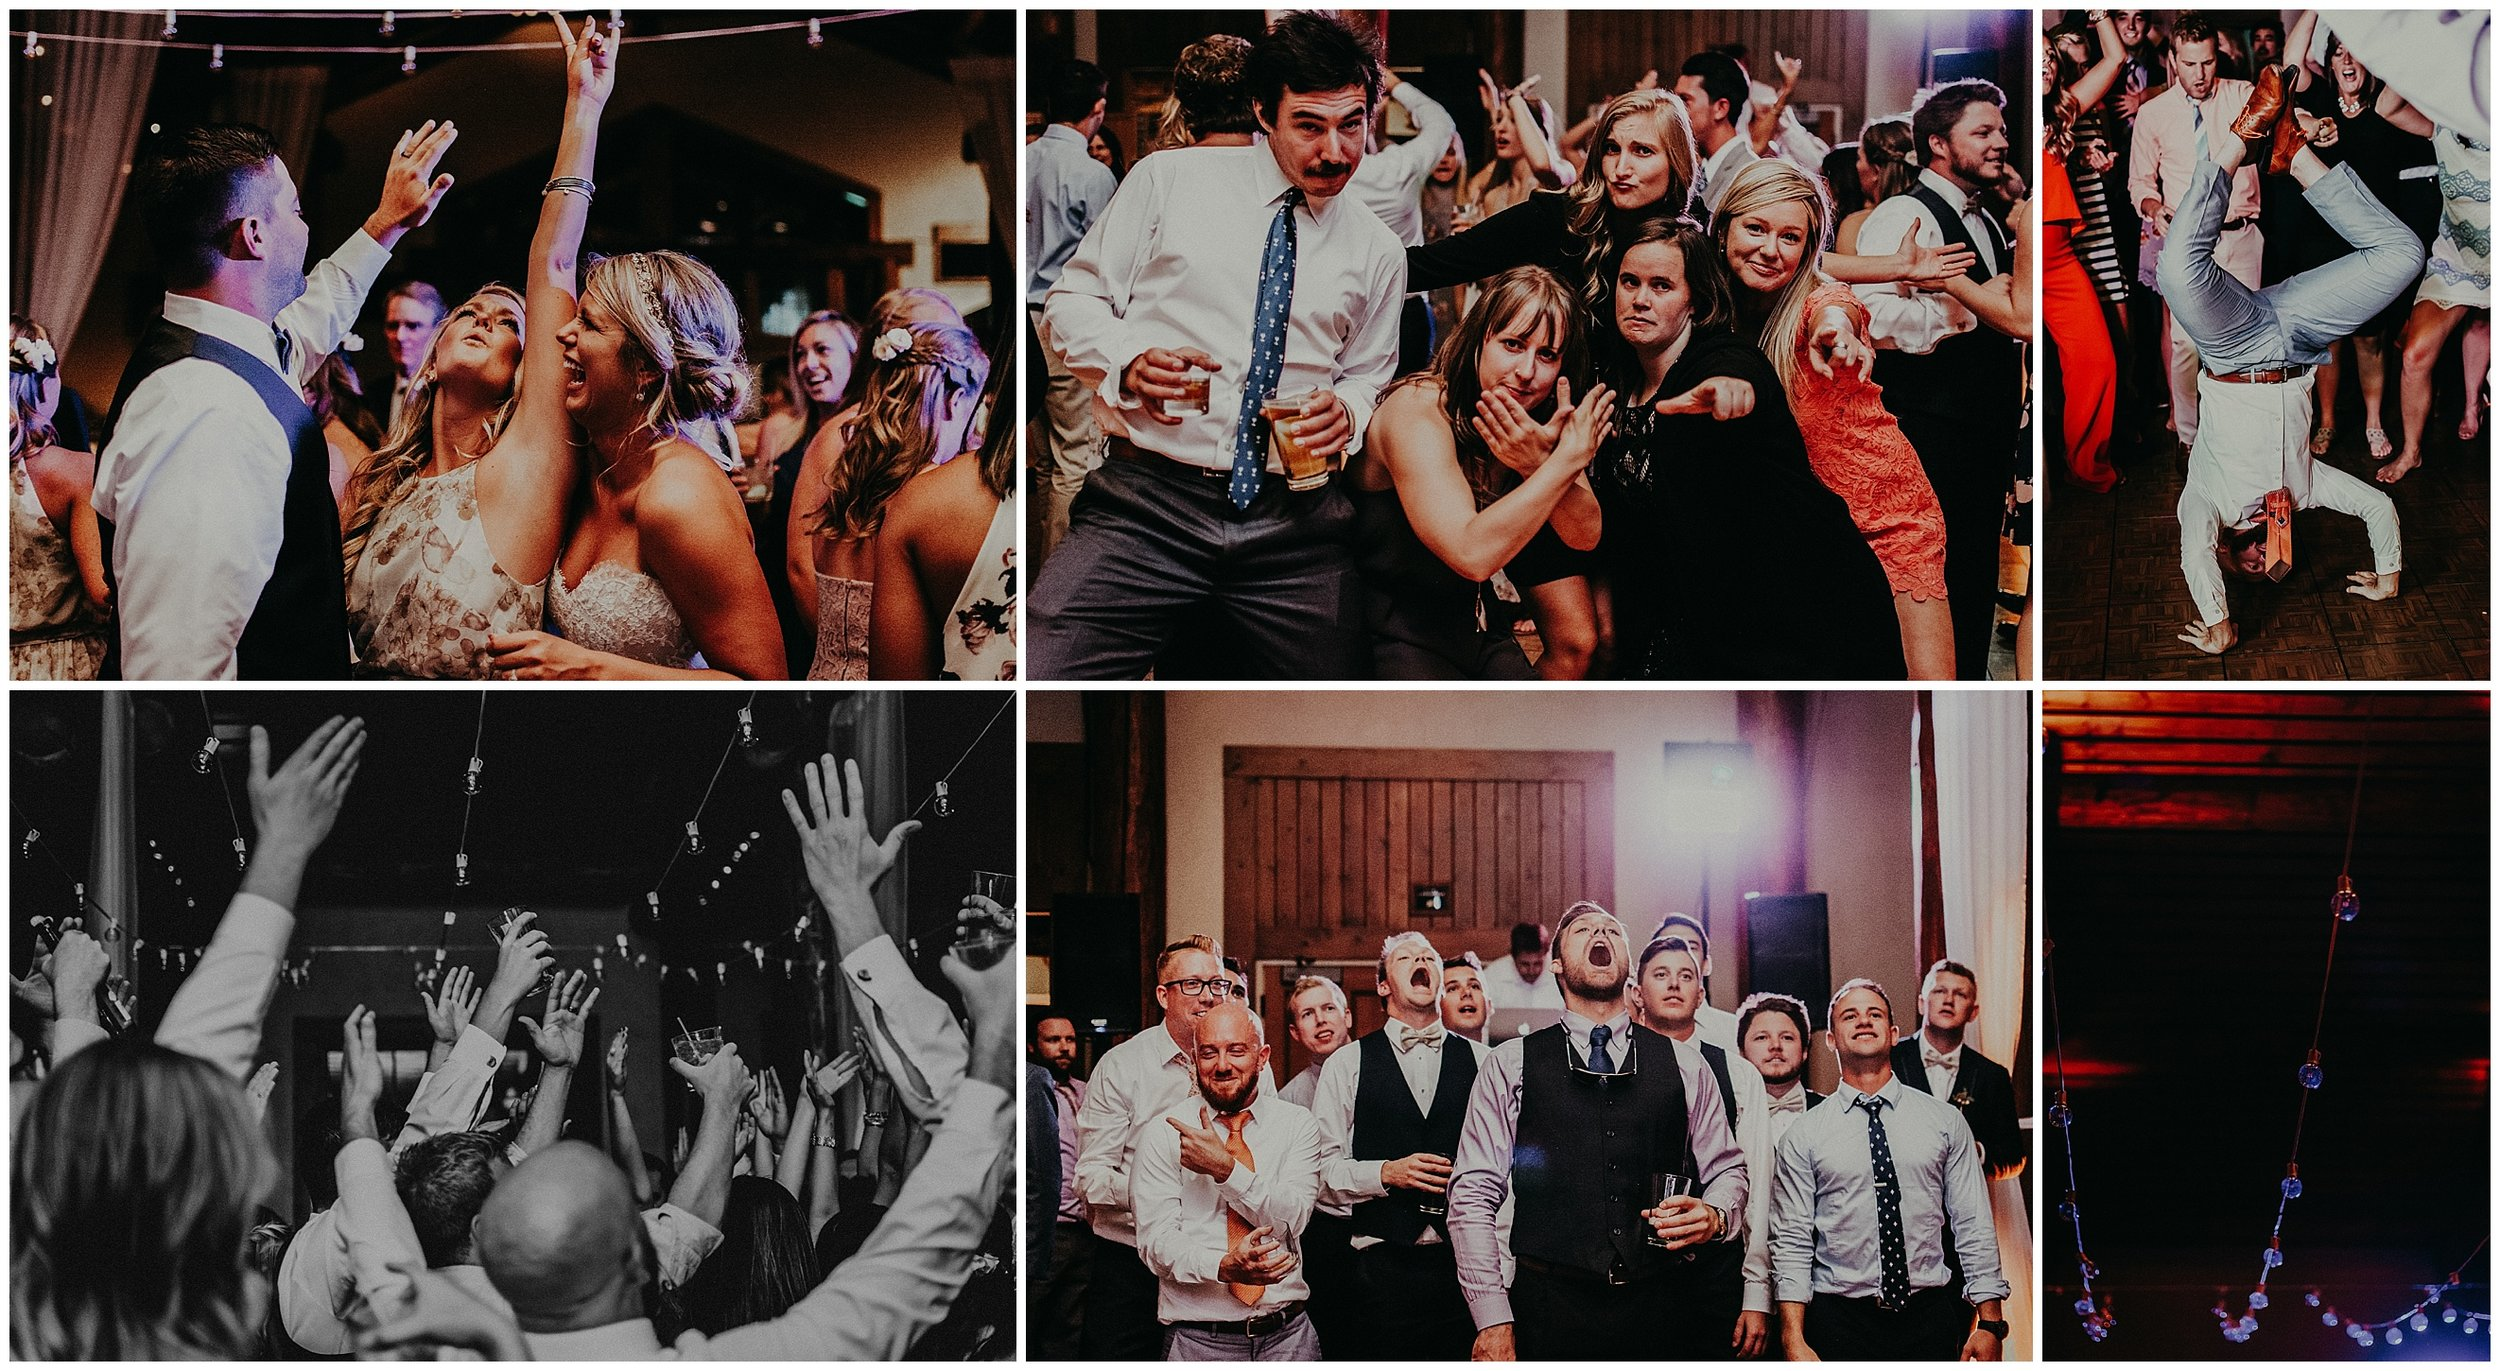 keystone_colorado_wedding_photographer17